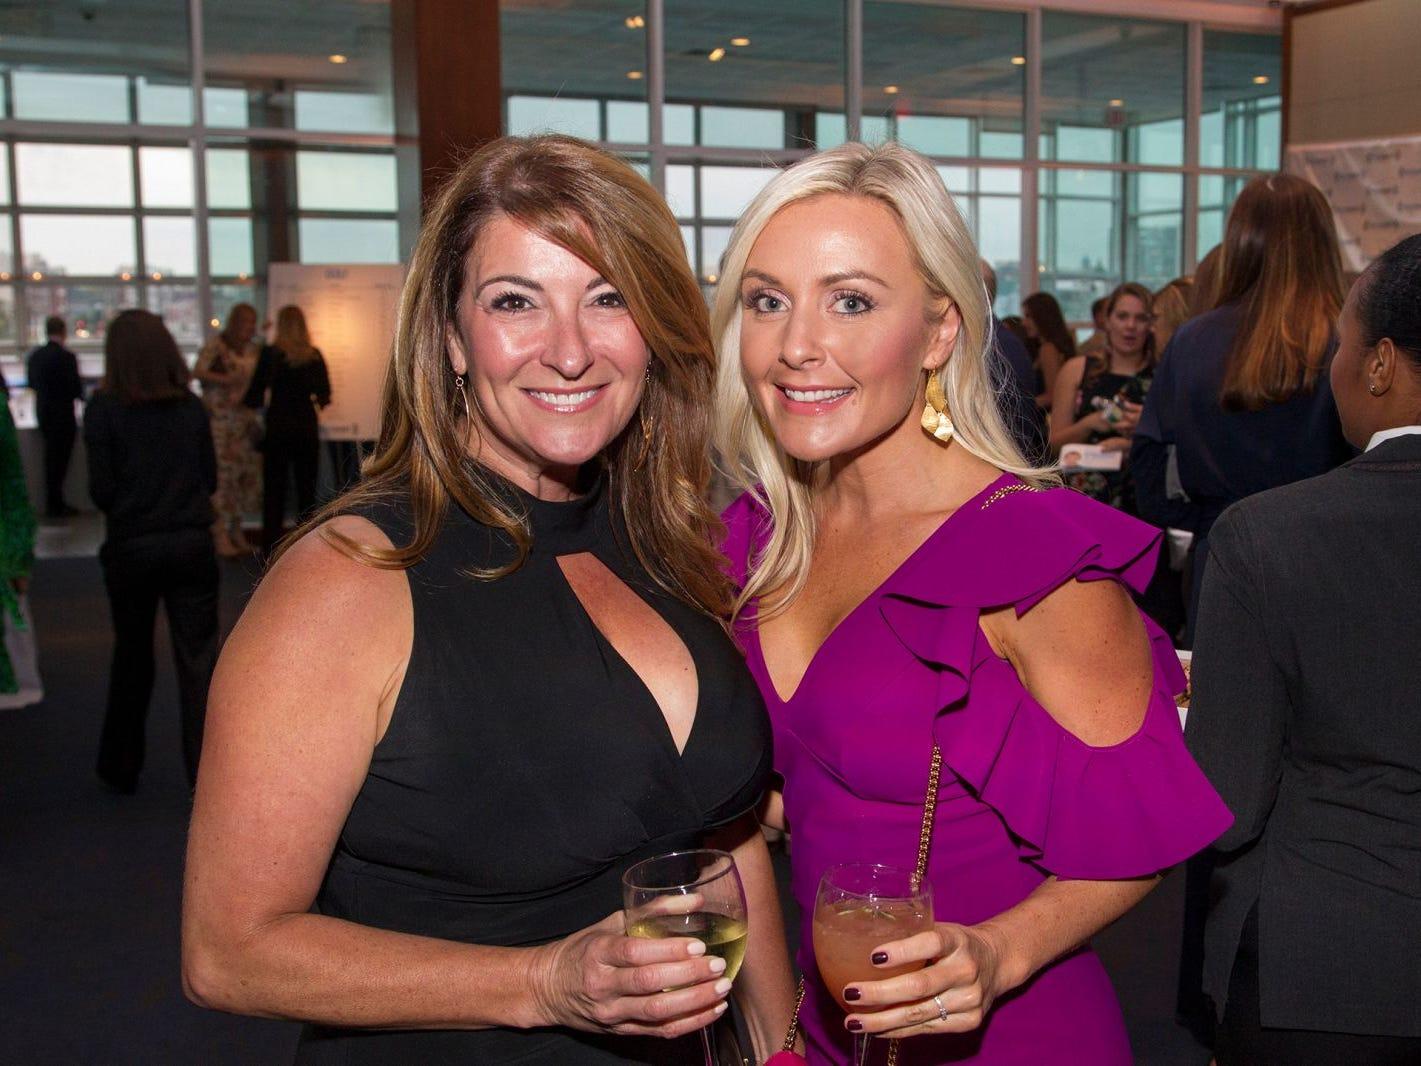 Julie Costello and Renee Hopke. 11th annual IronMatt Fundraiser Gala at Pier 60 Chelsea Piers. 09/20/2018